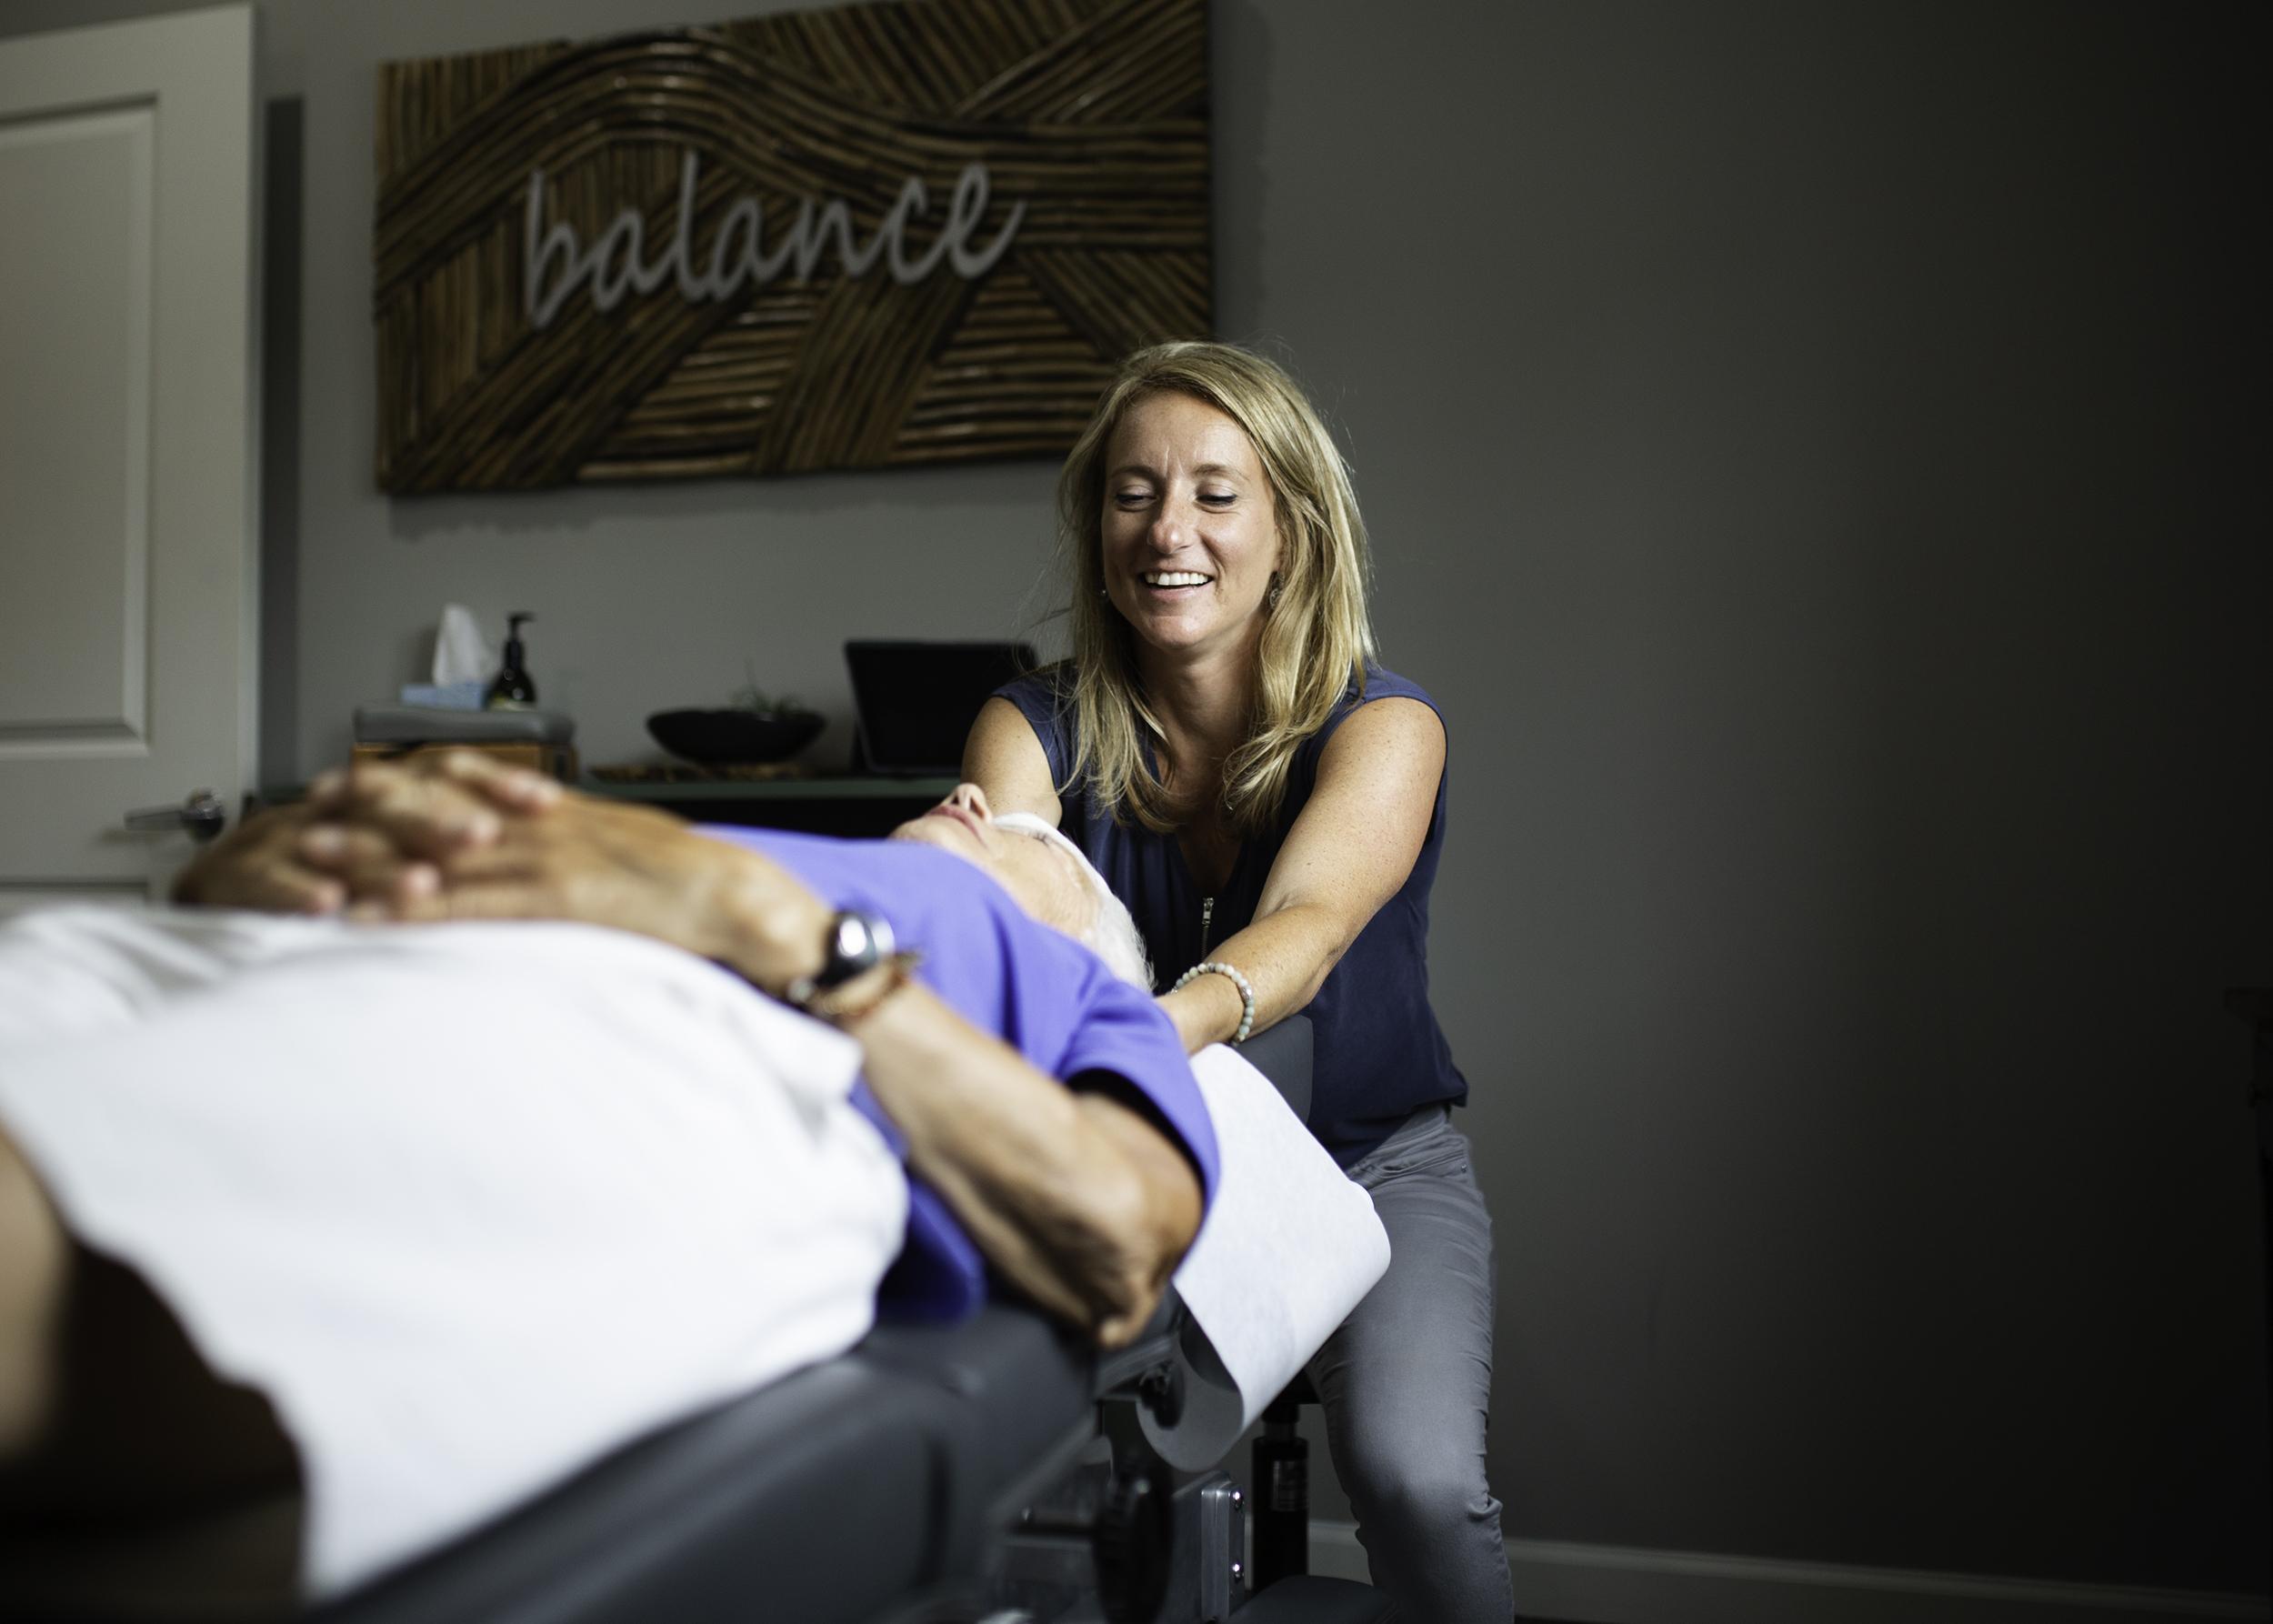 chiropractic-adjustment-business-photography-canandaigua-new-york-erin-cunningham.jpg